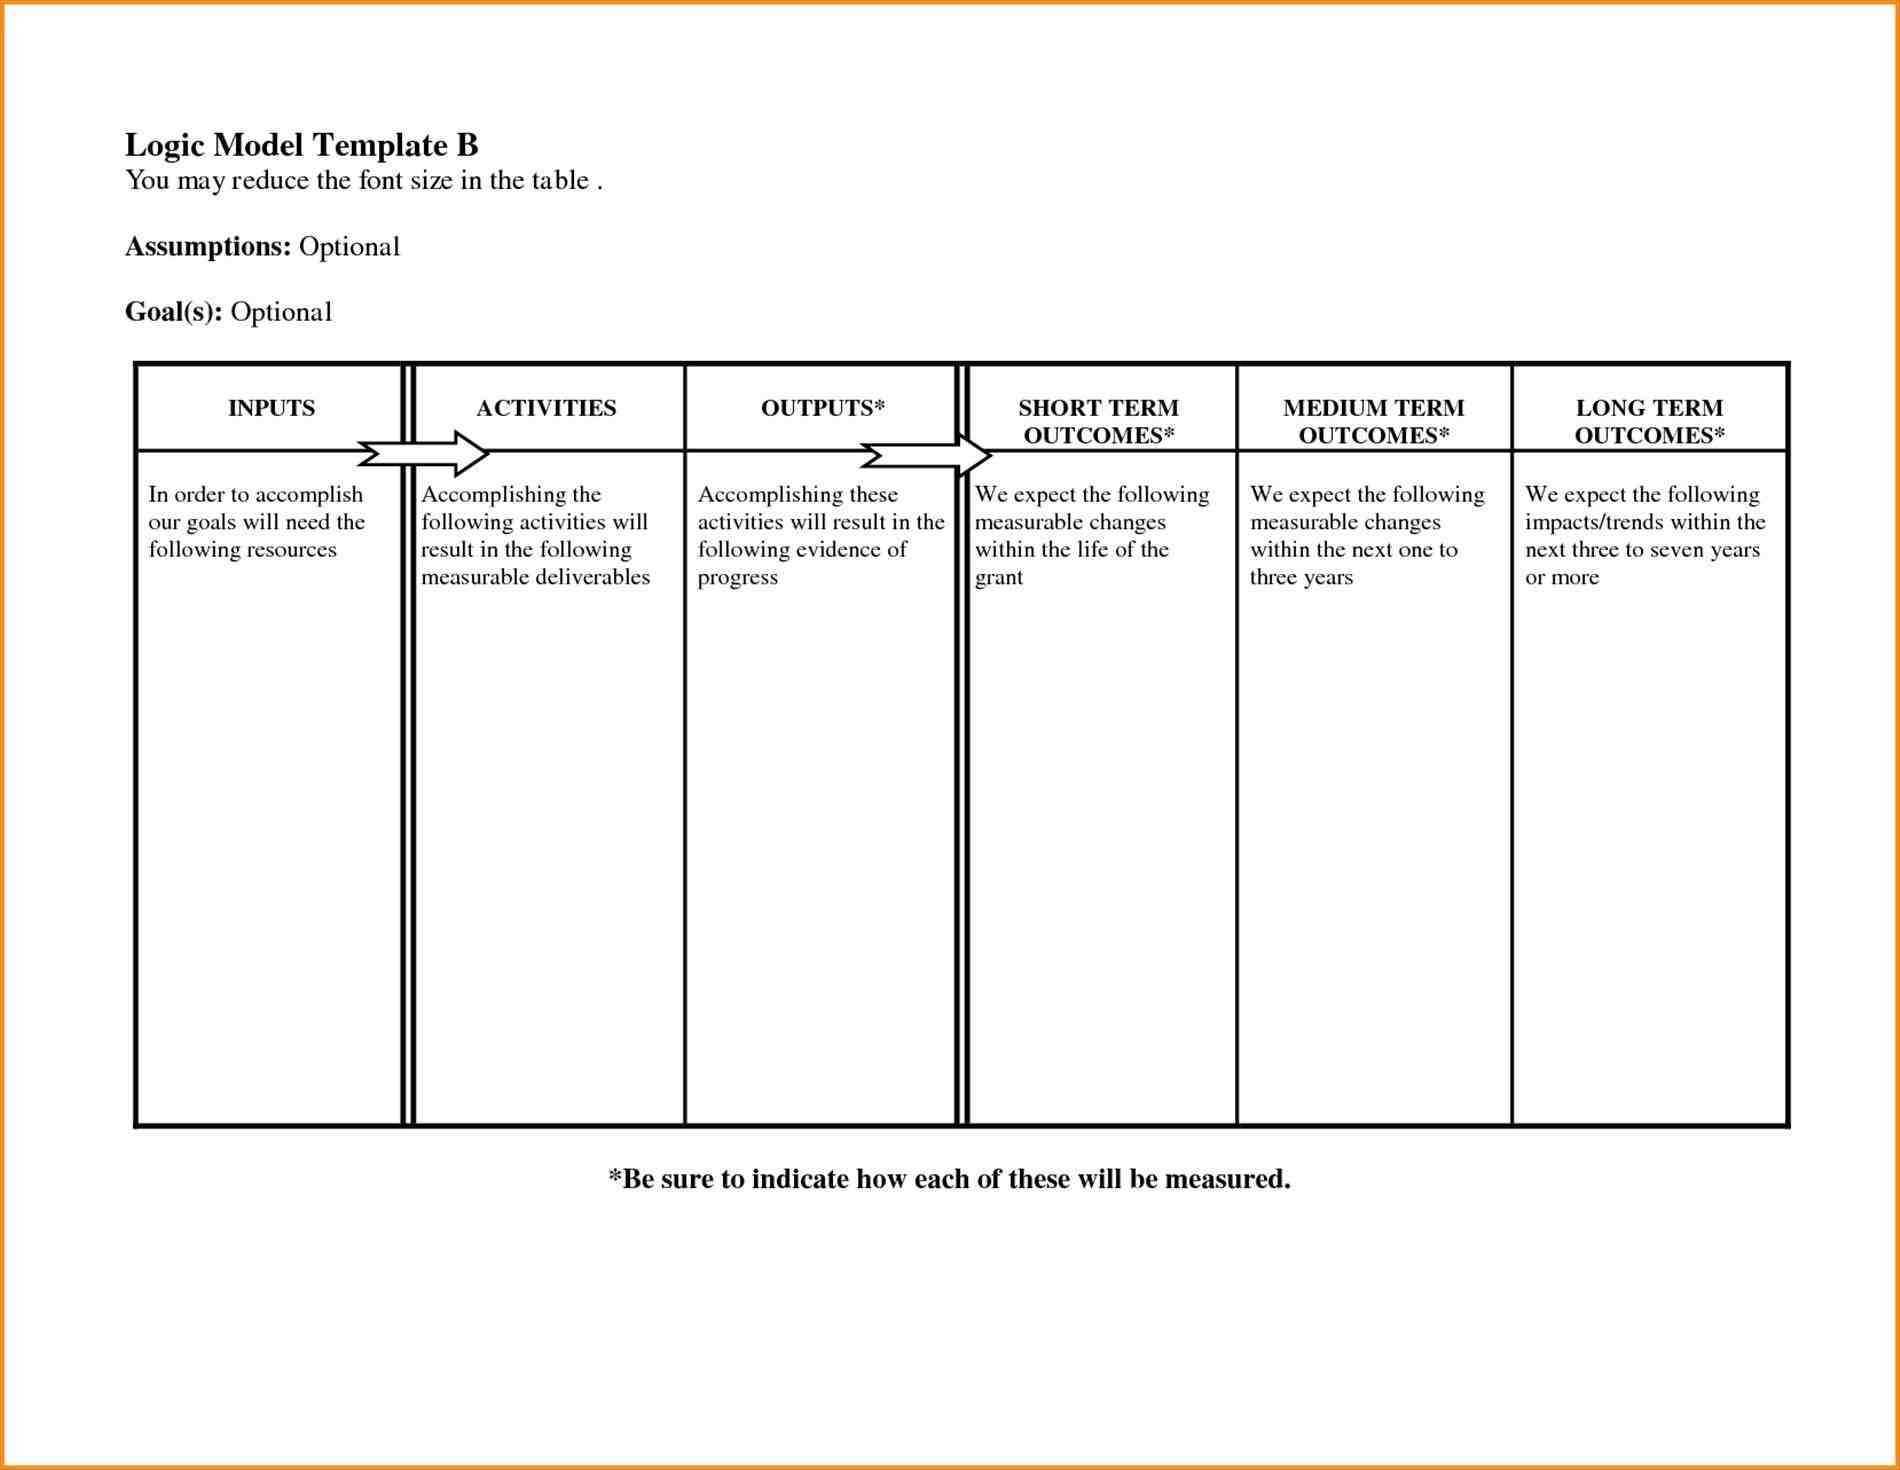 Logic Model Template Microsoft Word - Atlantaauctionco Pertaining To Logic Model Template Word